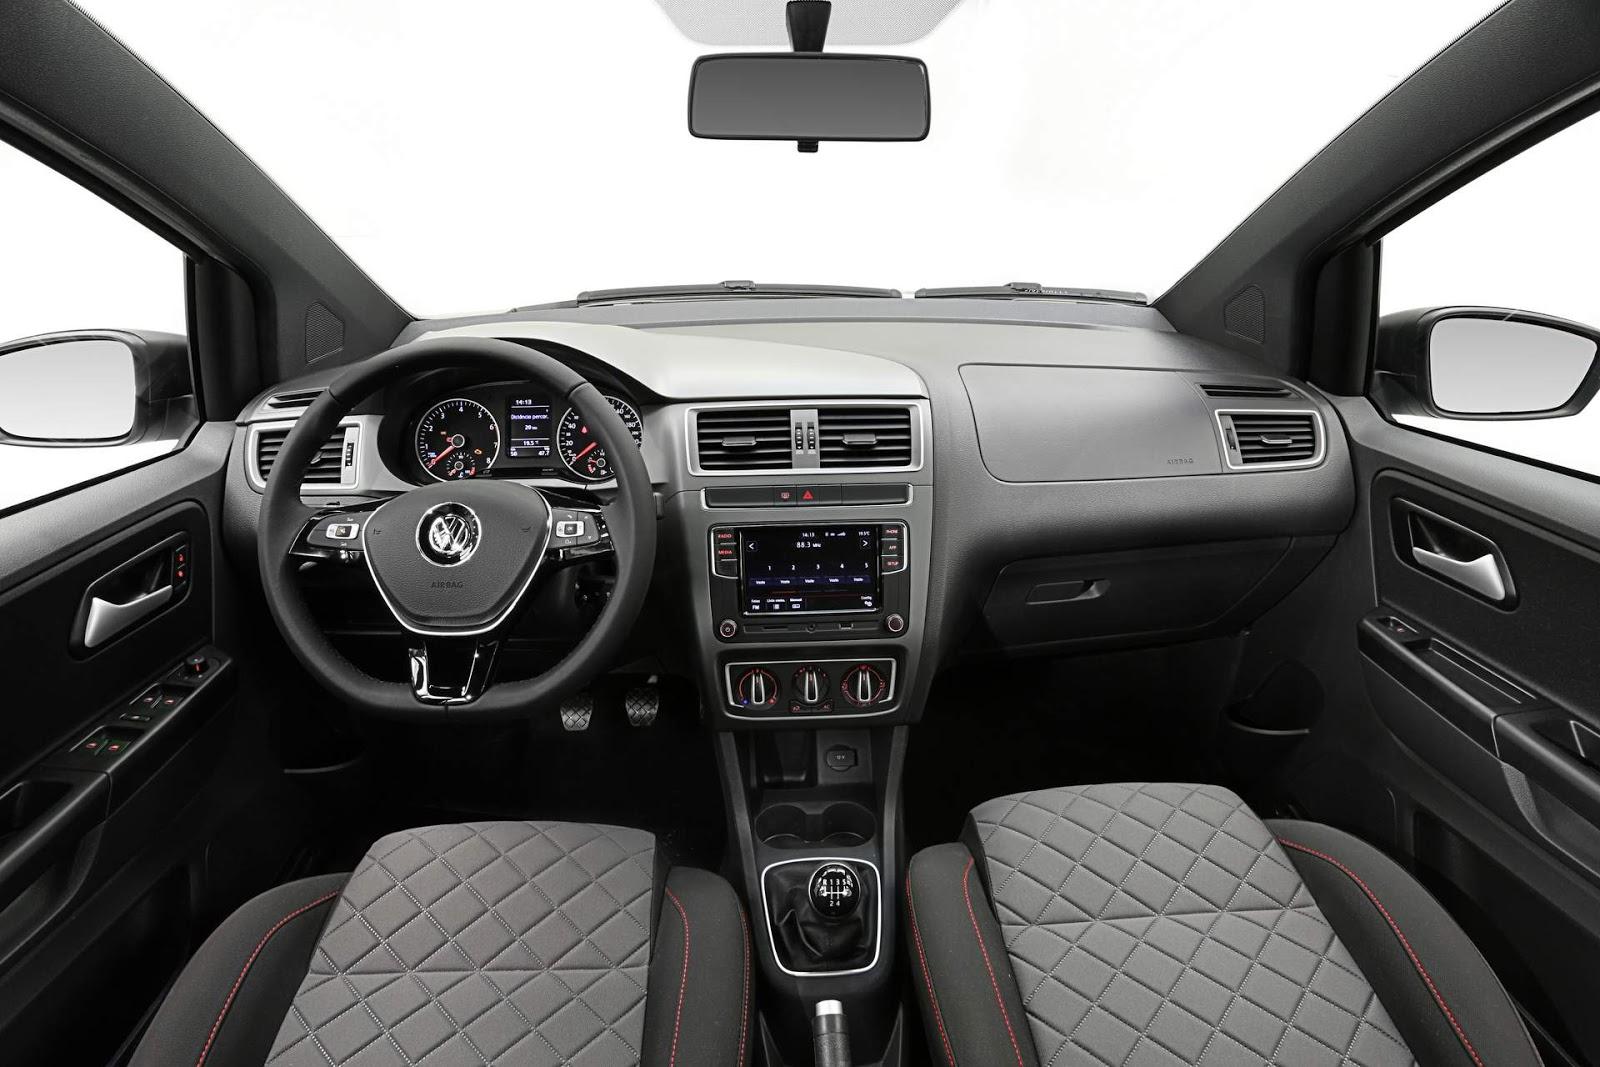 Volkswagen Fox sai do configurador on-line do site da marca